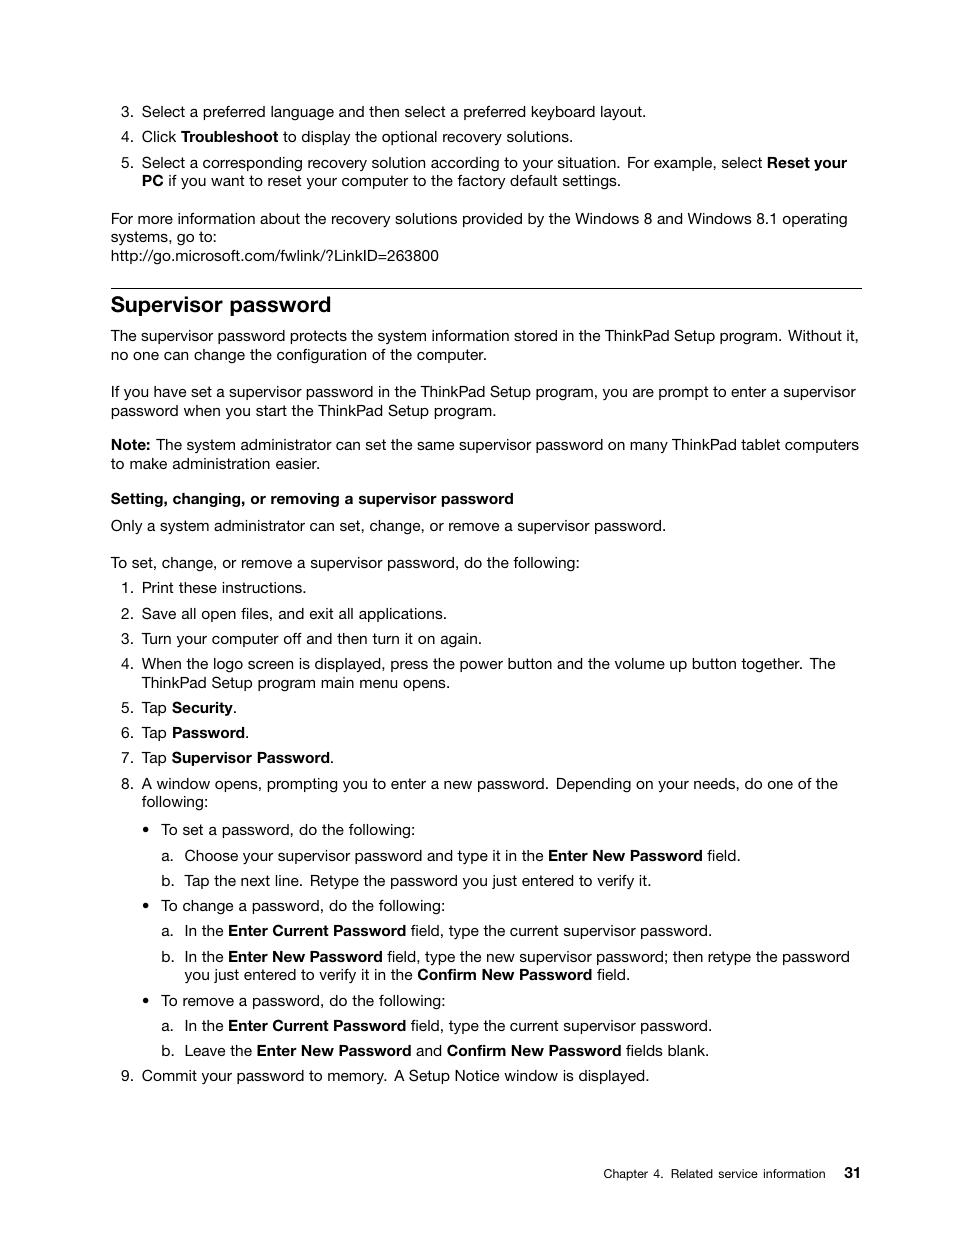 Supervisor password | Lenovo ThinkPad Tablet 2 User Manual | Page 37